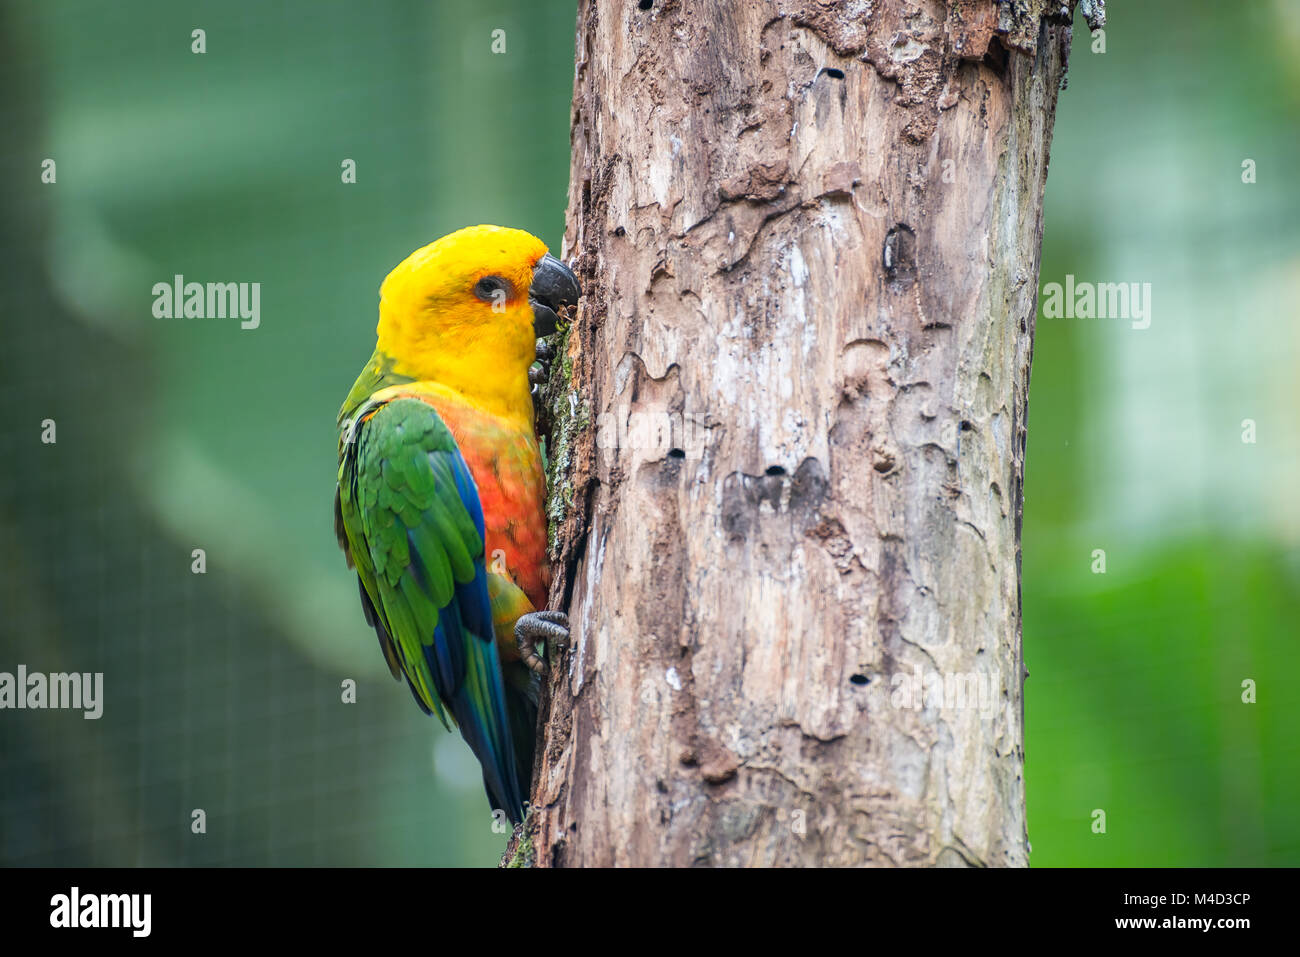 Golden conure parrot (Guaruba guarouba) at the Parque das Aves - Stock Image